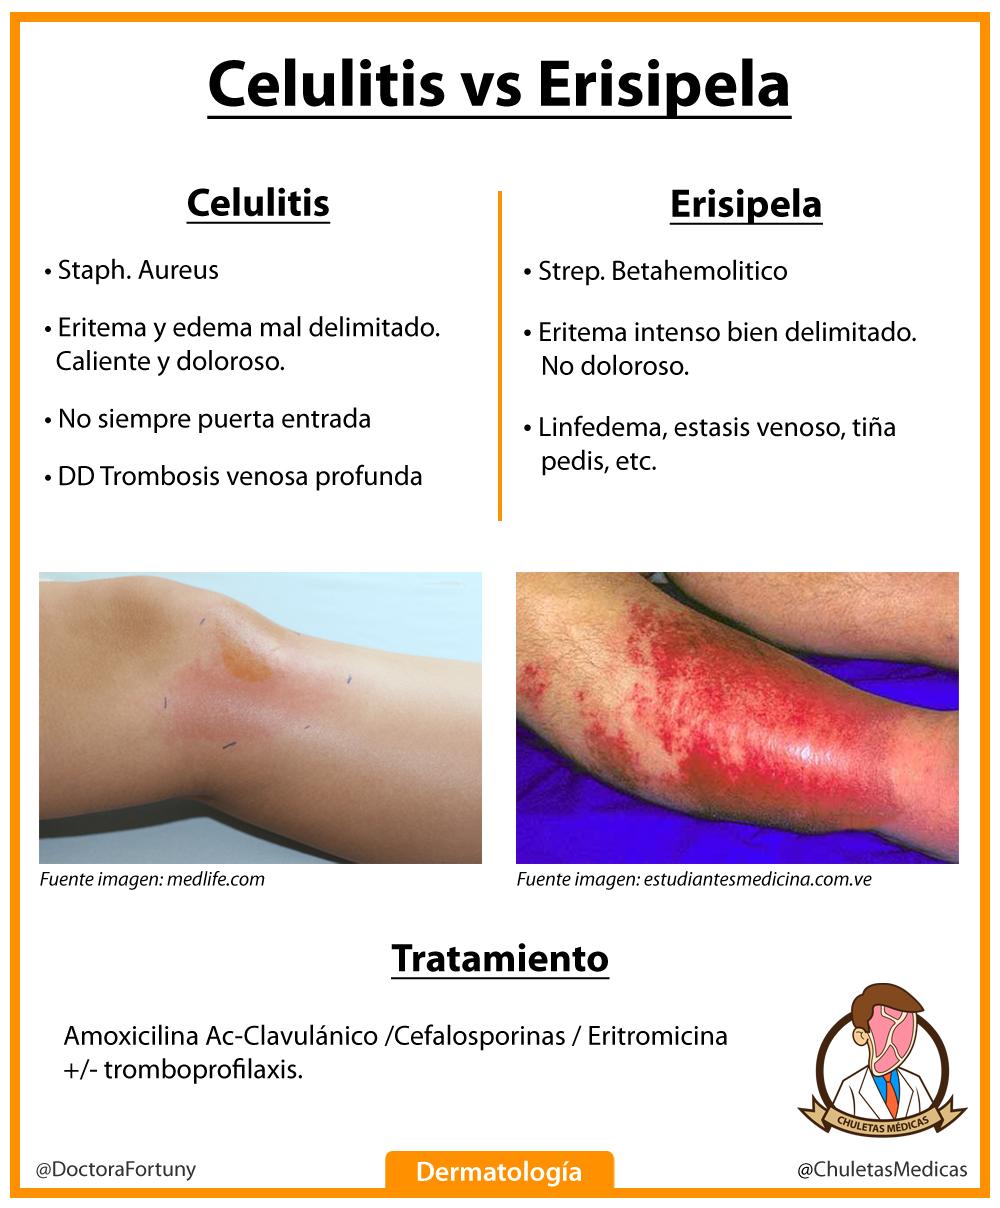 Celulitis vs Erisipela: Diagnóstico diferencial chuleta